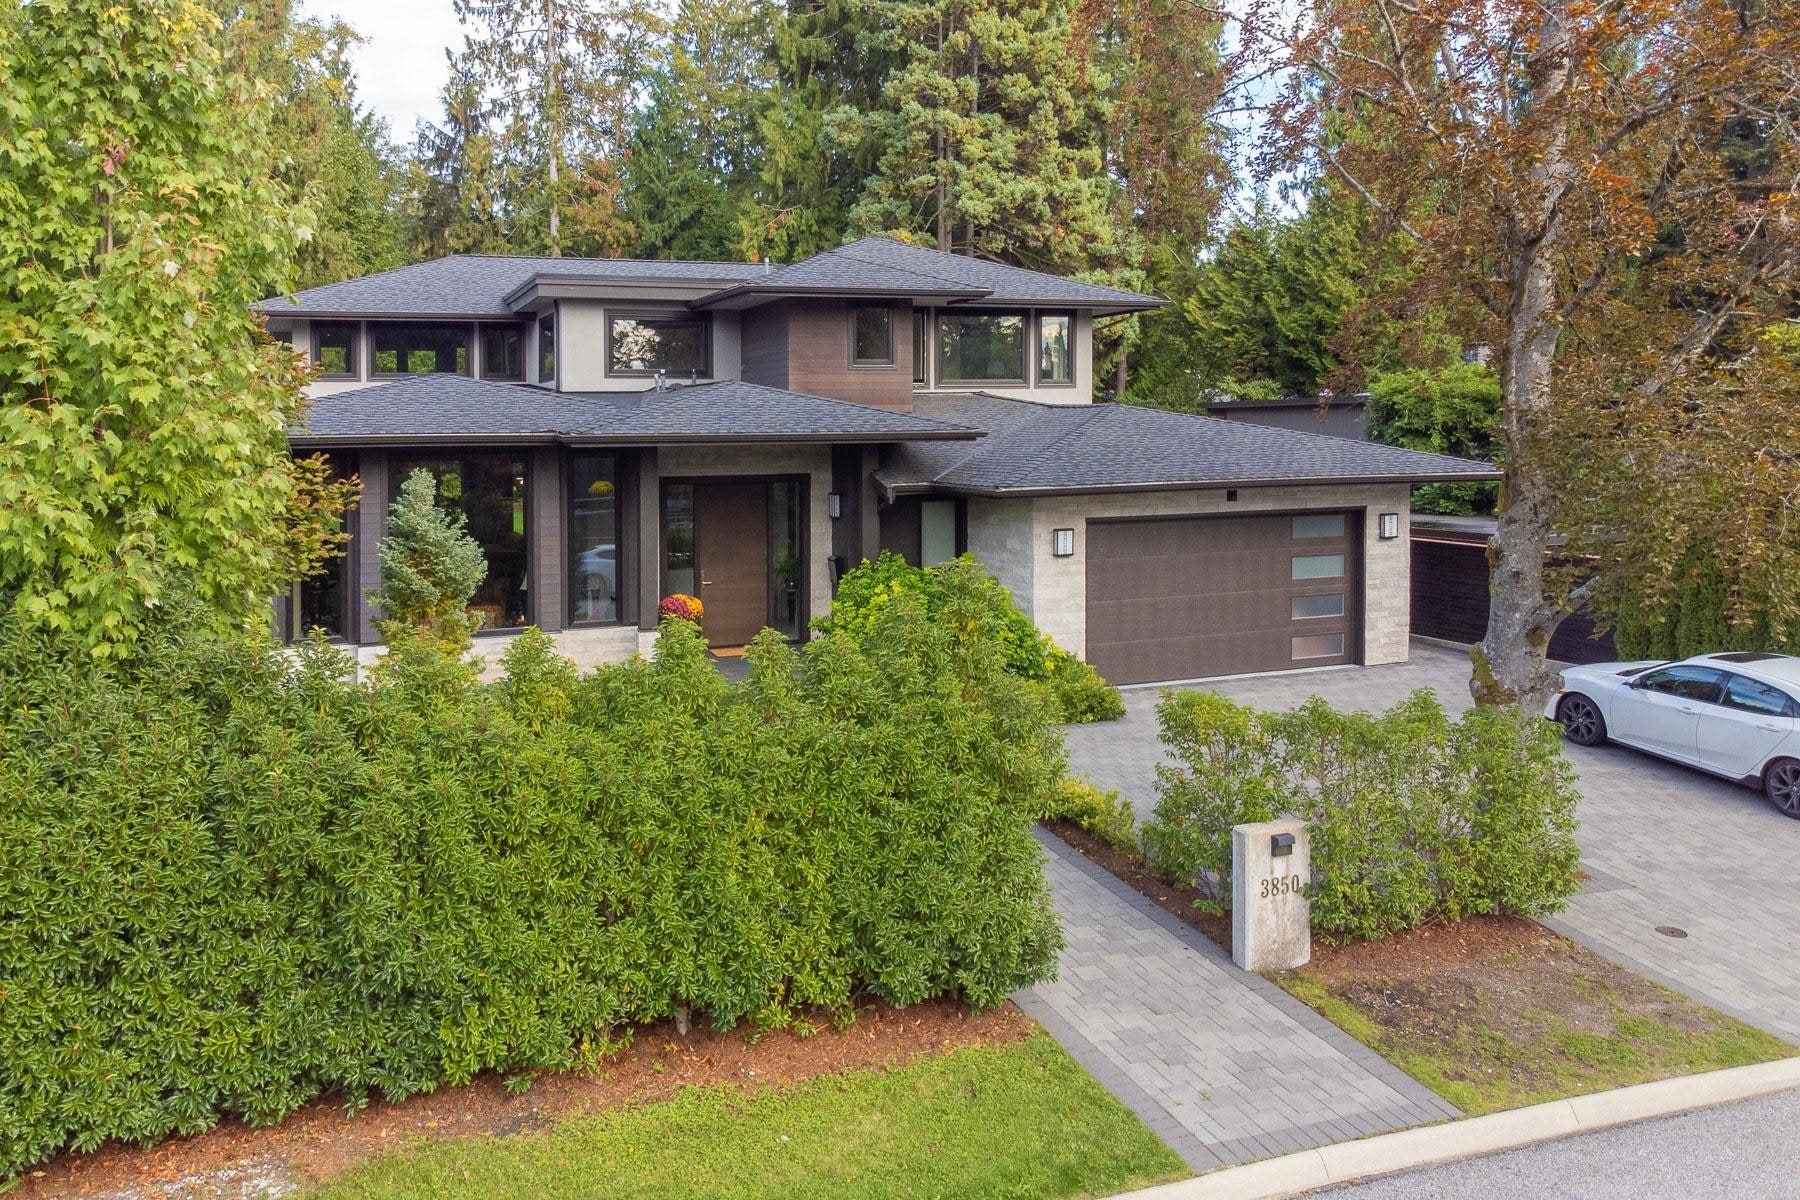 3850 HILLCREST AVENUE - Edgemont House/Single Family for sale, 5 Bedrooms (R2621492)